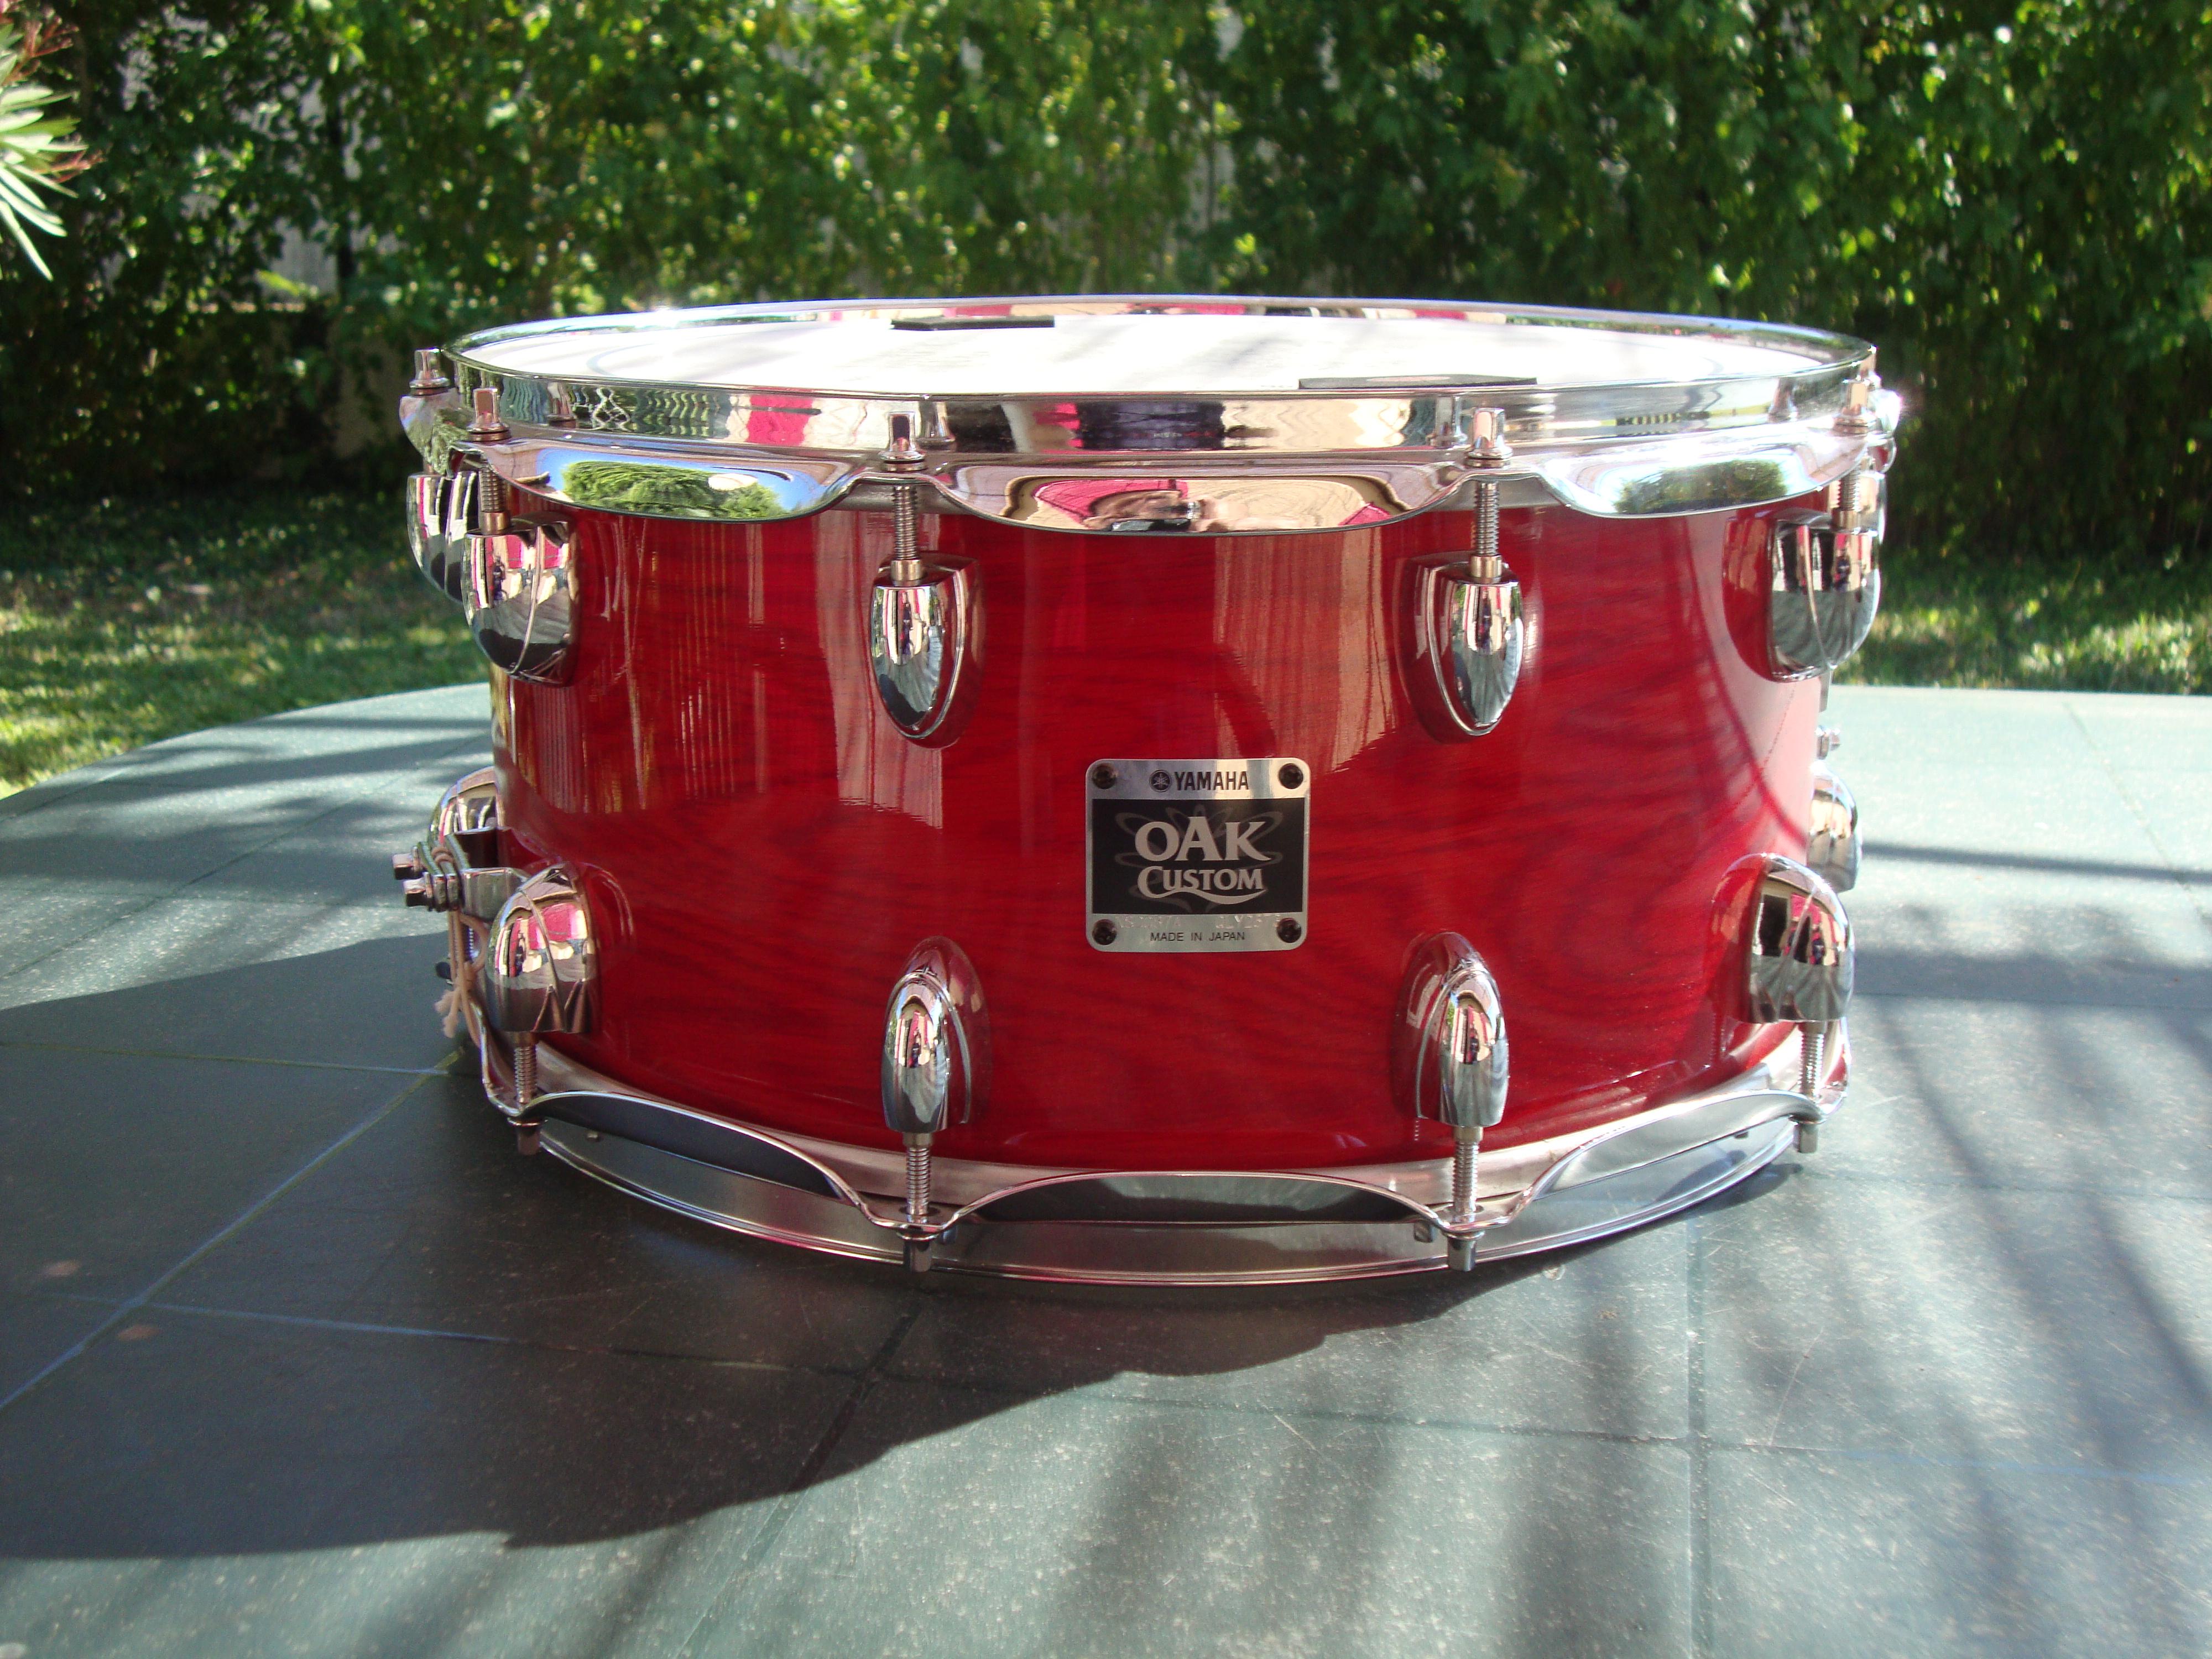 oak custom snare 14x6 5 yamaha oak custom snare 14x6 5 audiofanzine. Black Bedroom Furniture Sets. Home Design Ideas